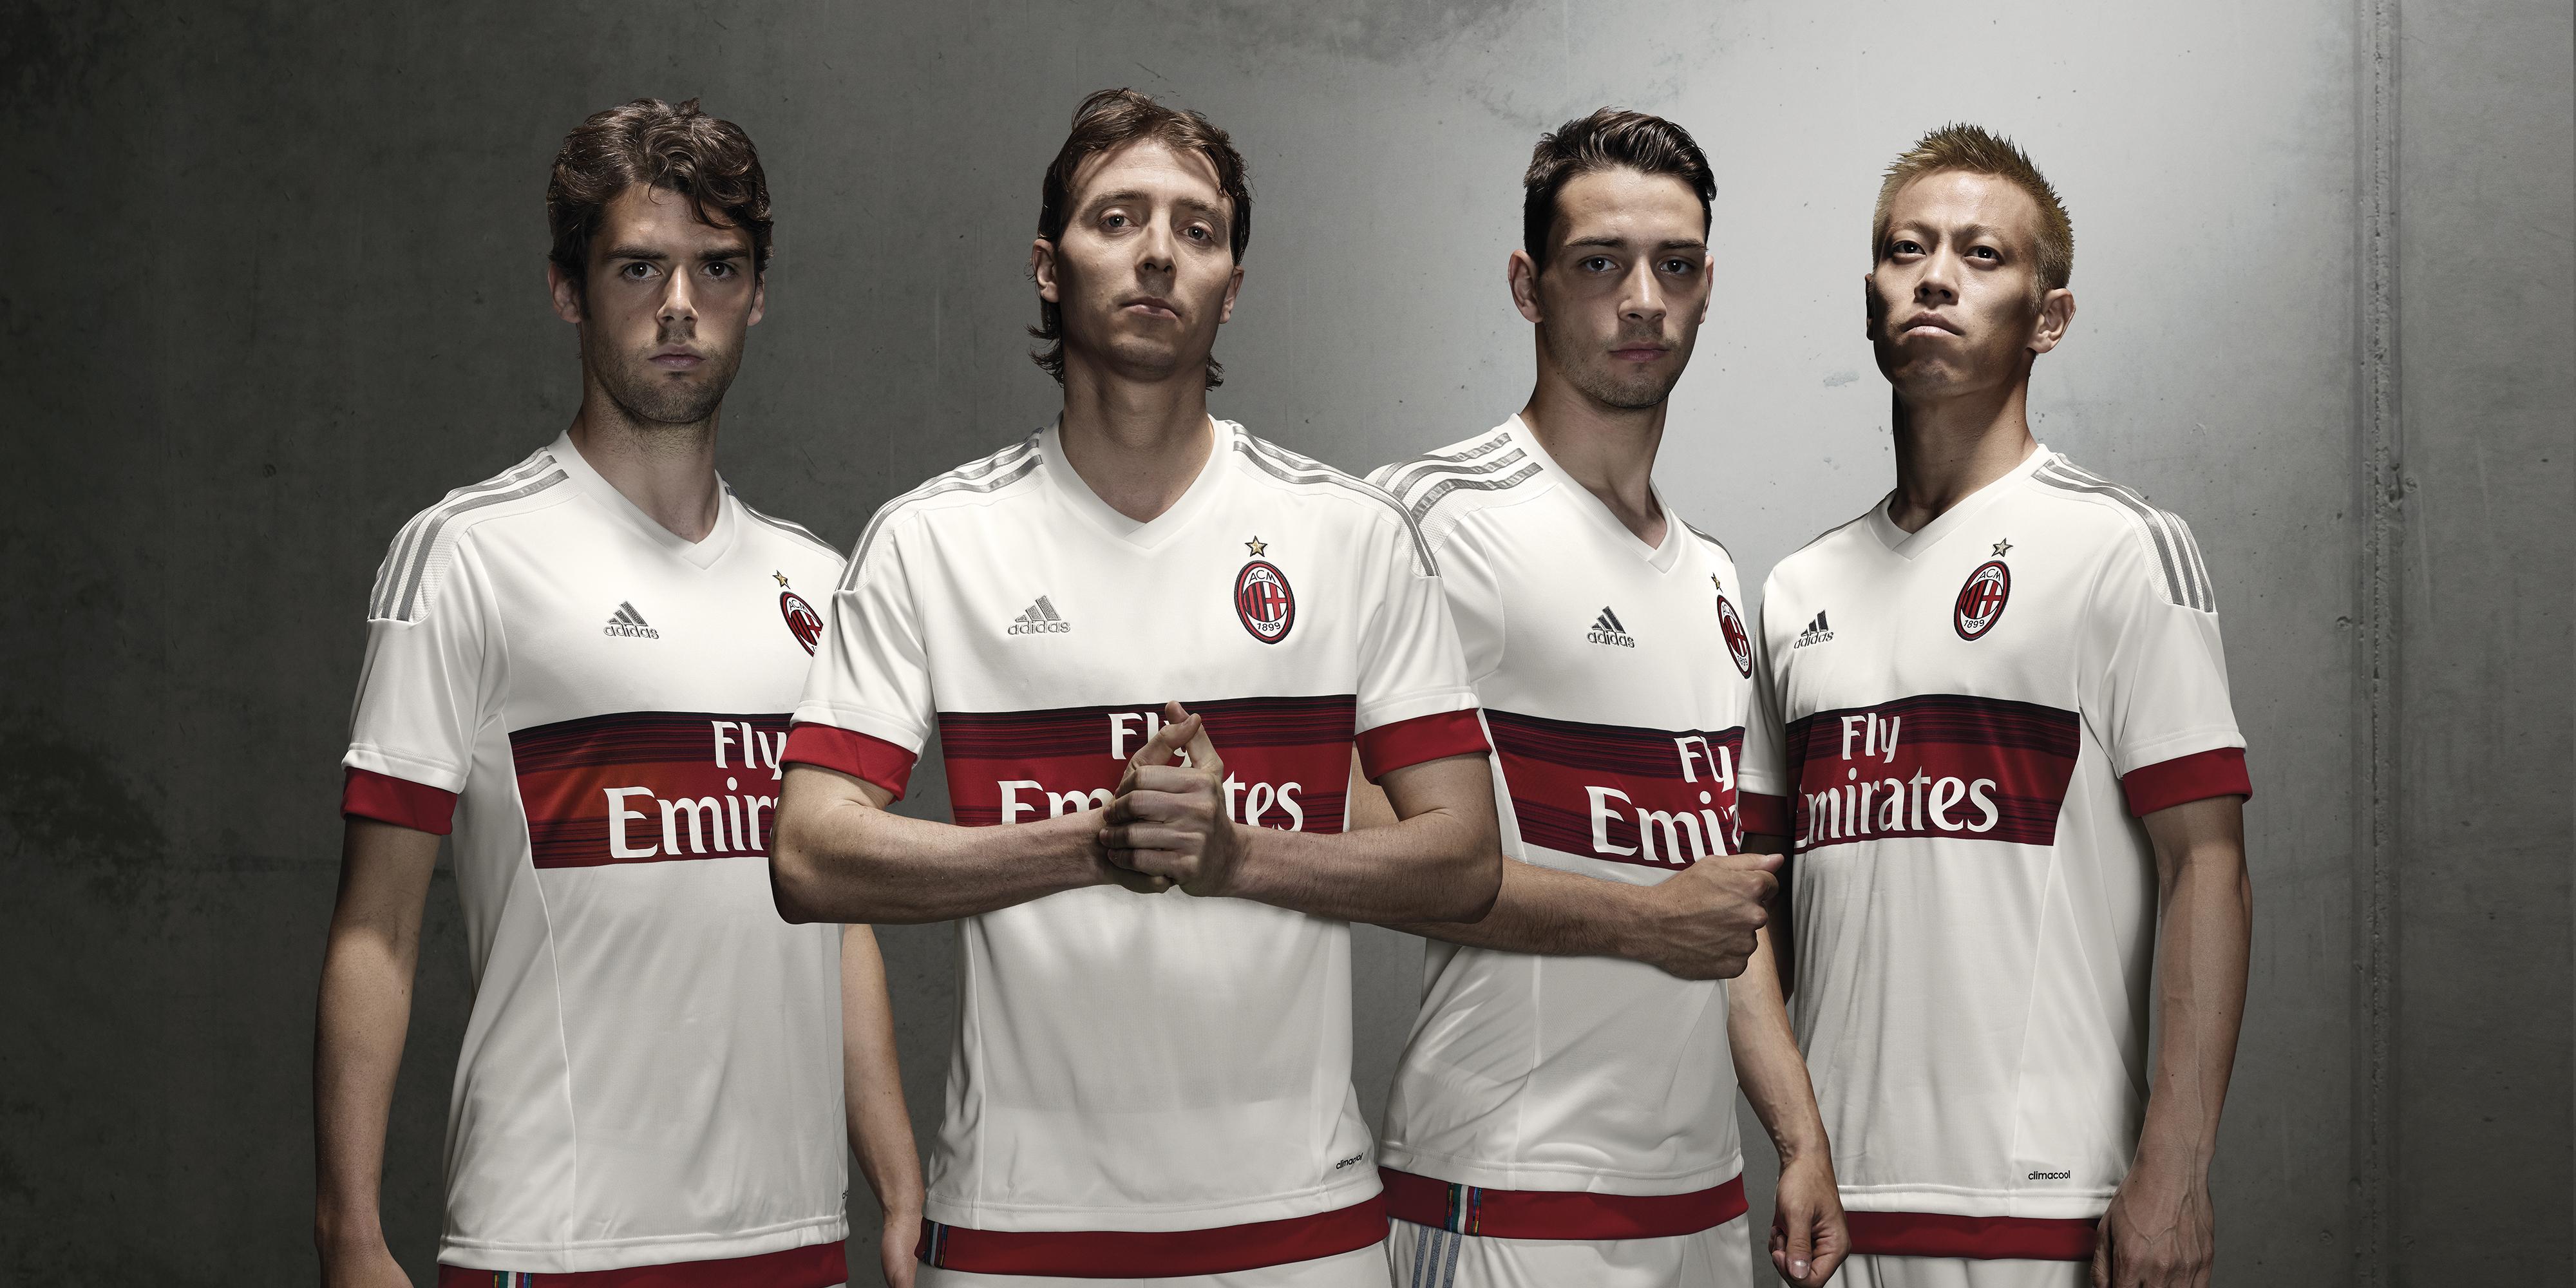 Calciatori Milan 2015 Del Milan 2015/2016 Nomi e